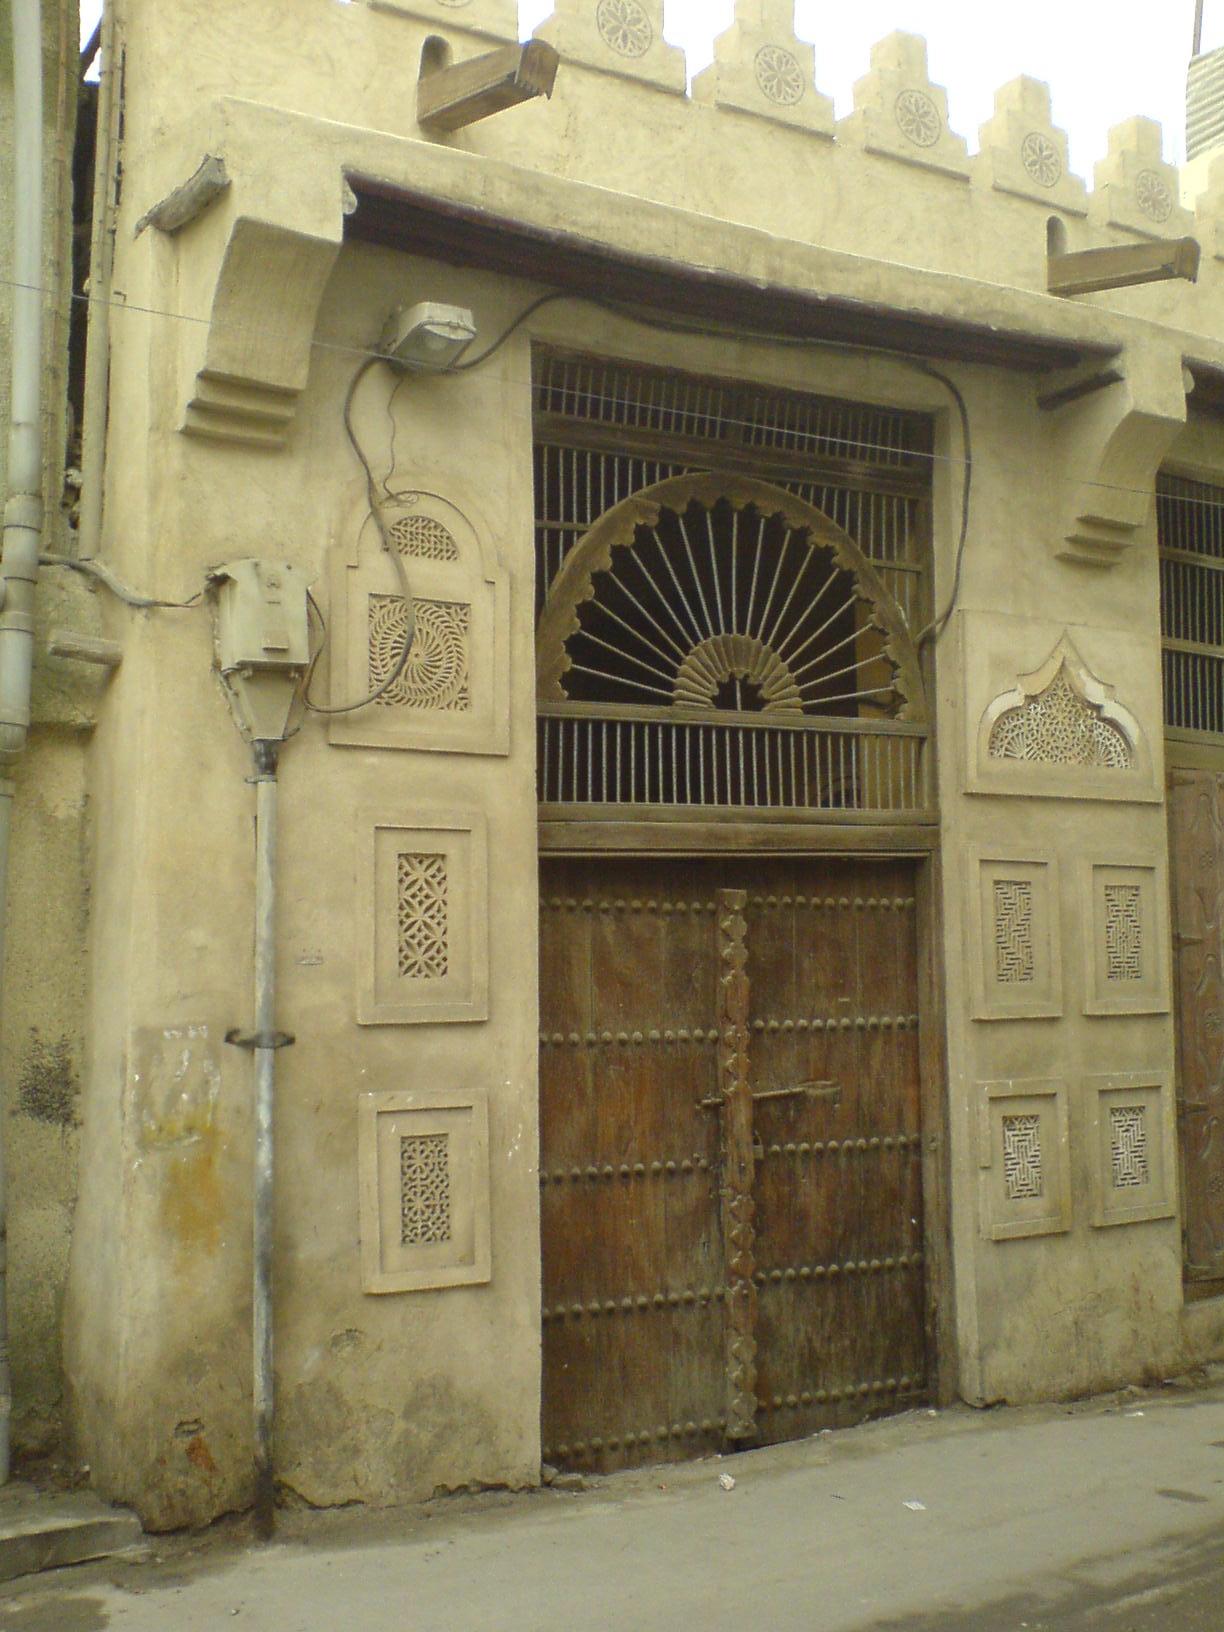 FileTraditional Bahrain door.jpg & File:Traditional Bahrain door.jpg - Wikimedia Commons